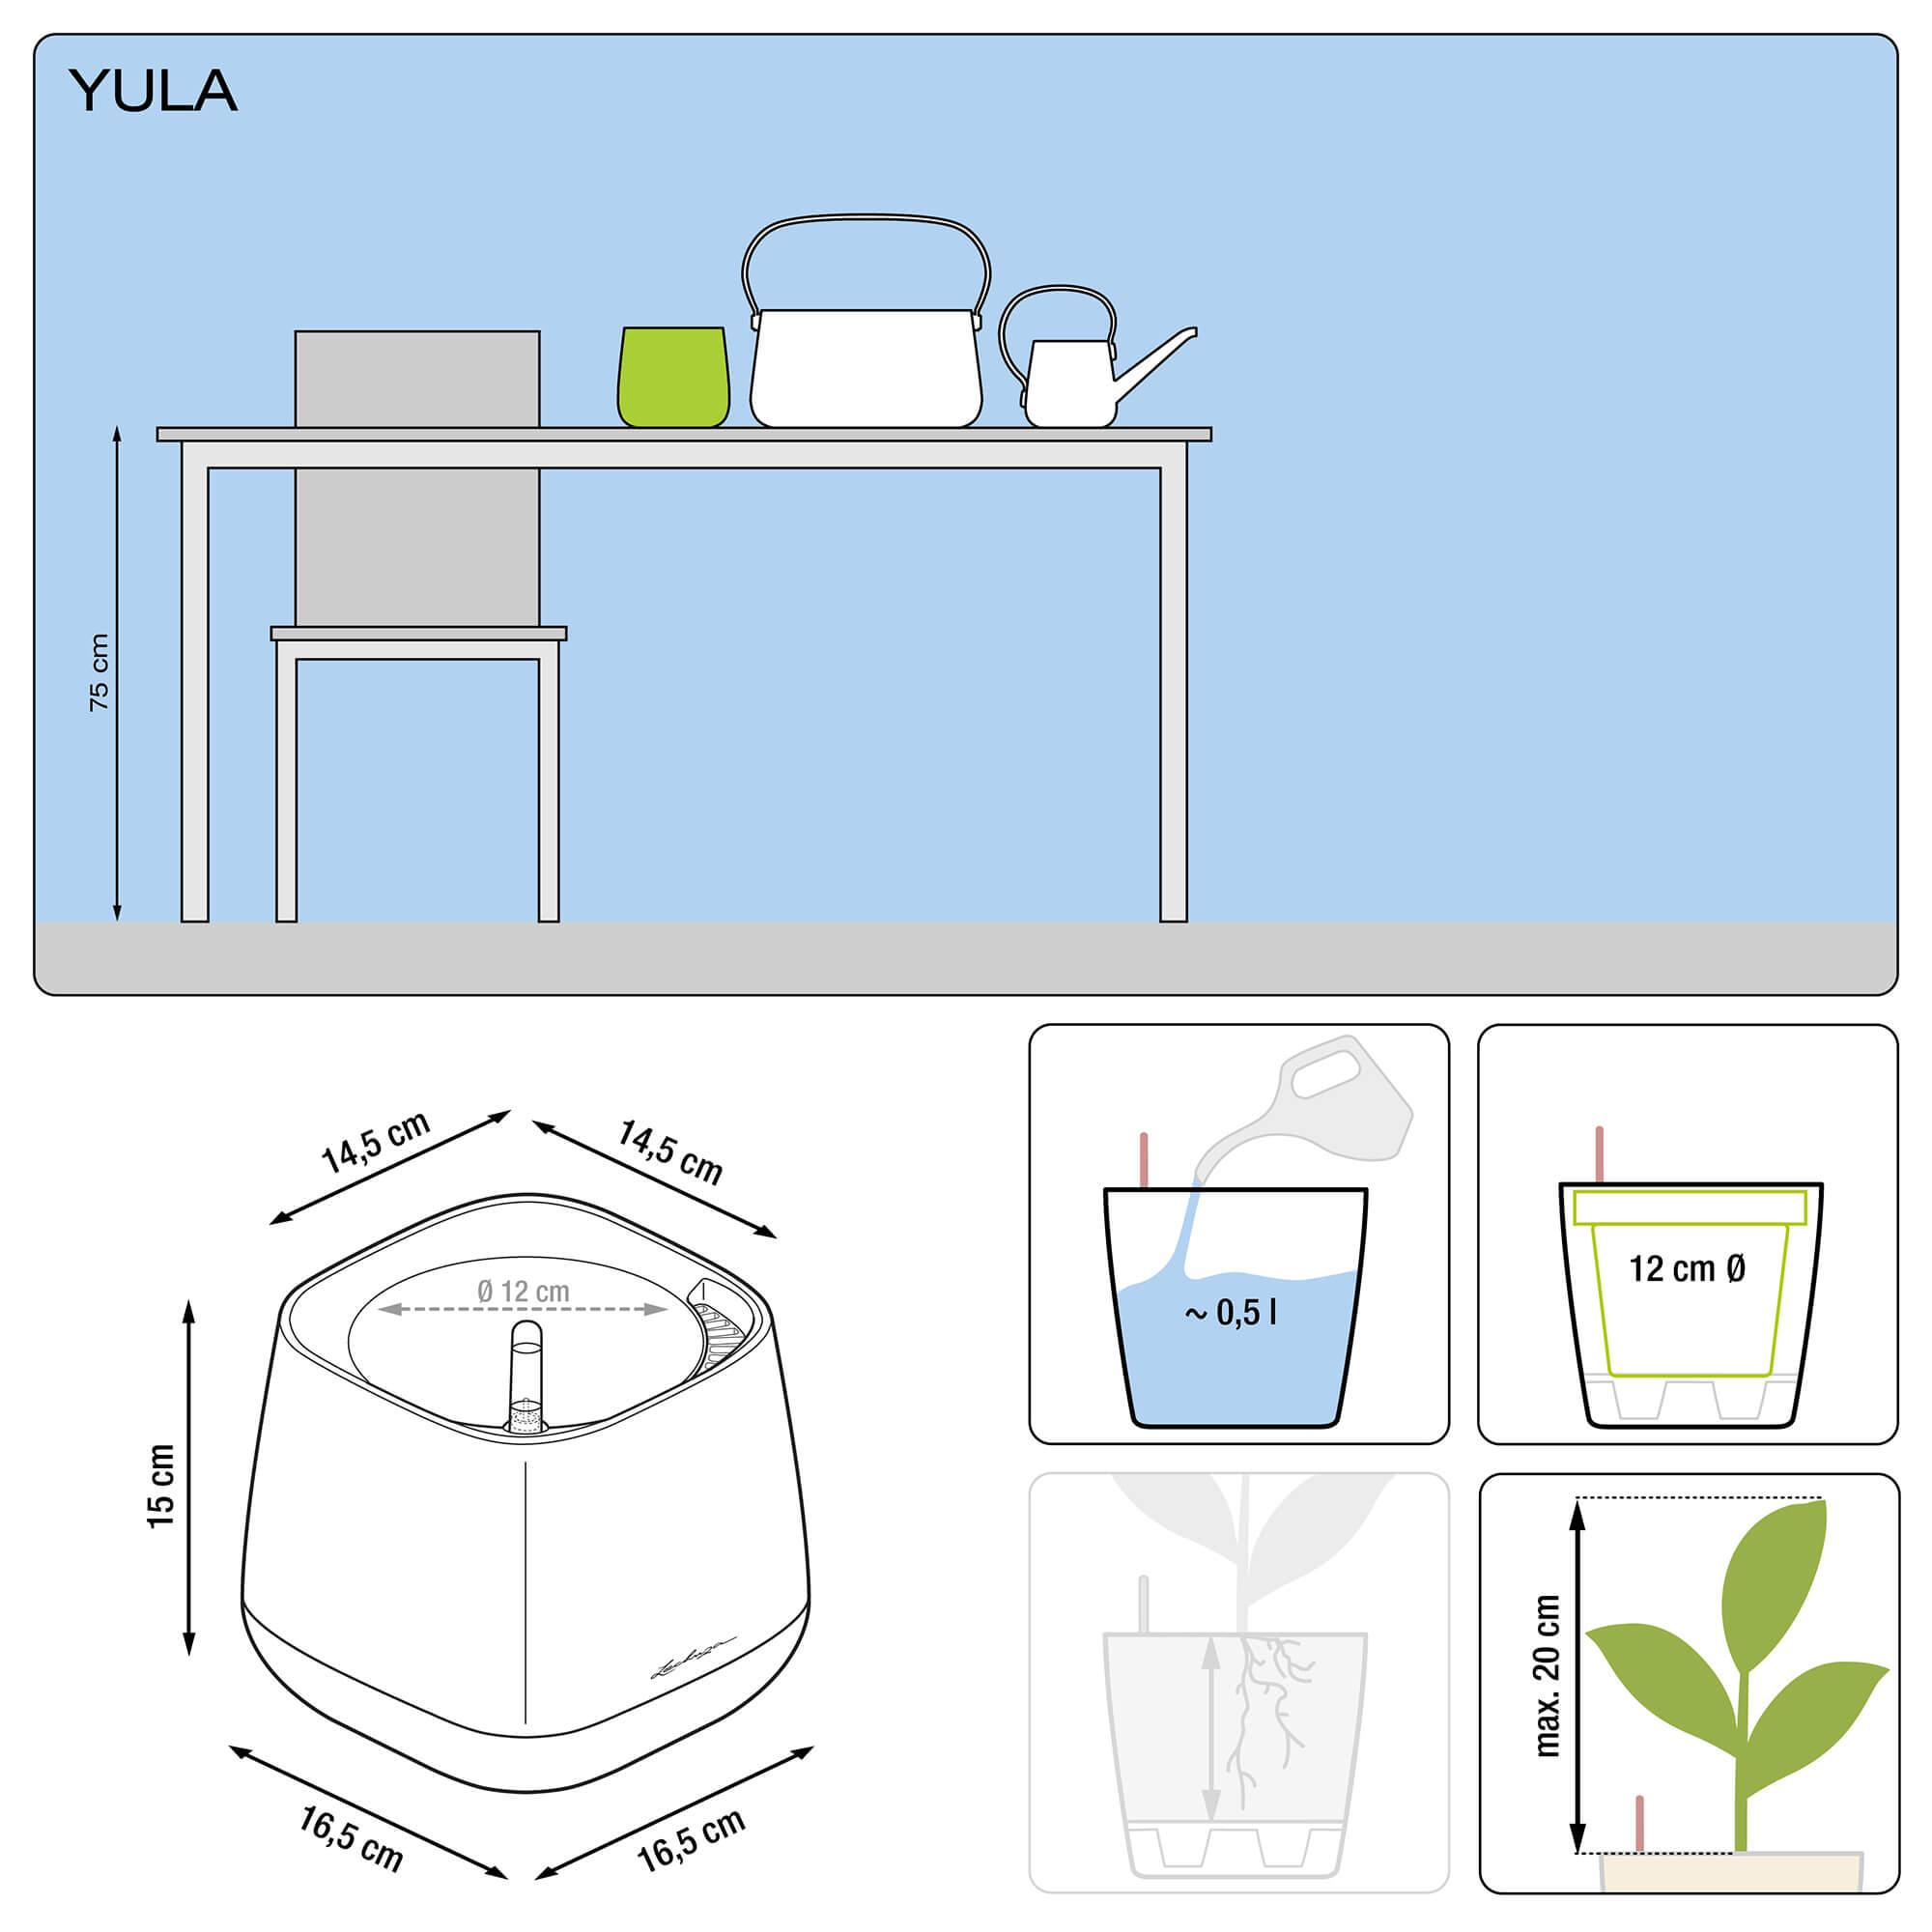 YULA planter white/pistachio semi-gloss - Image 2